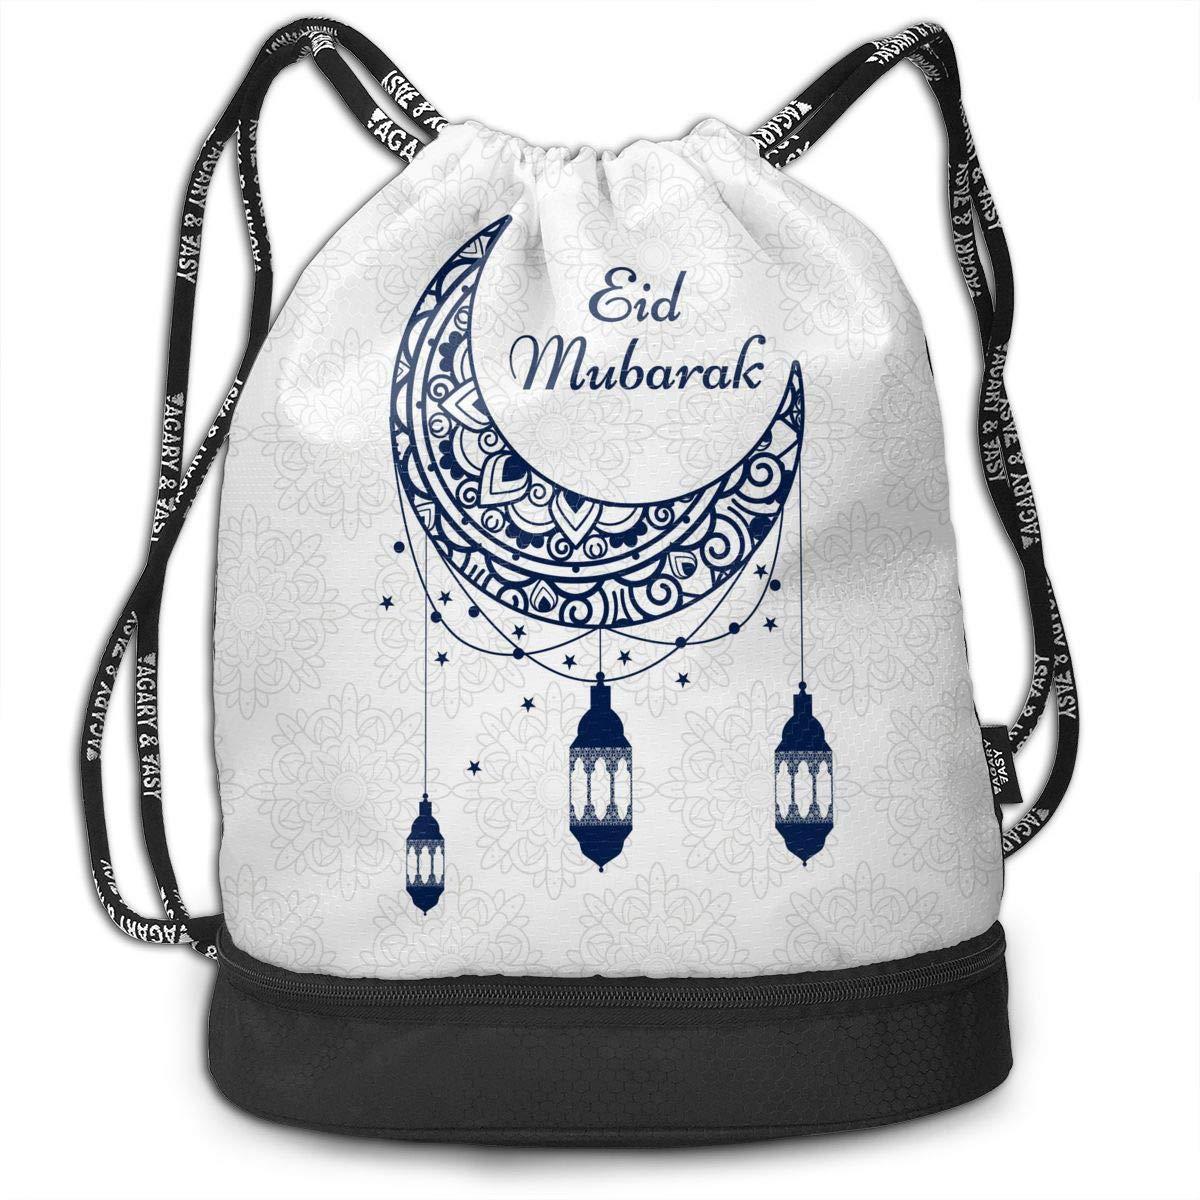 HUOPR5Q Colorful Galaxy Space Moon Star Drawstring Backpack Sport Gym Sack Shoulder Bulk Bag Dance Bag for School Travel